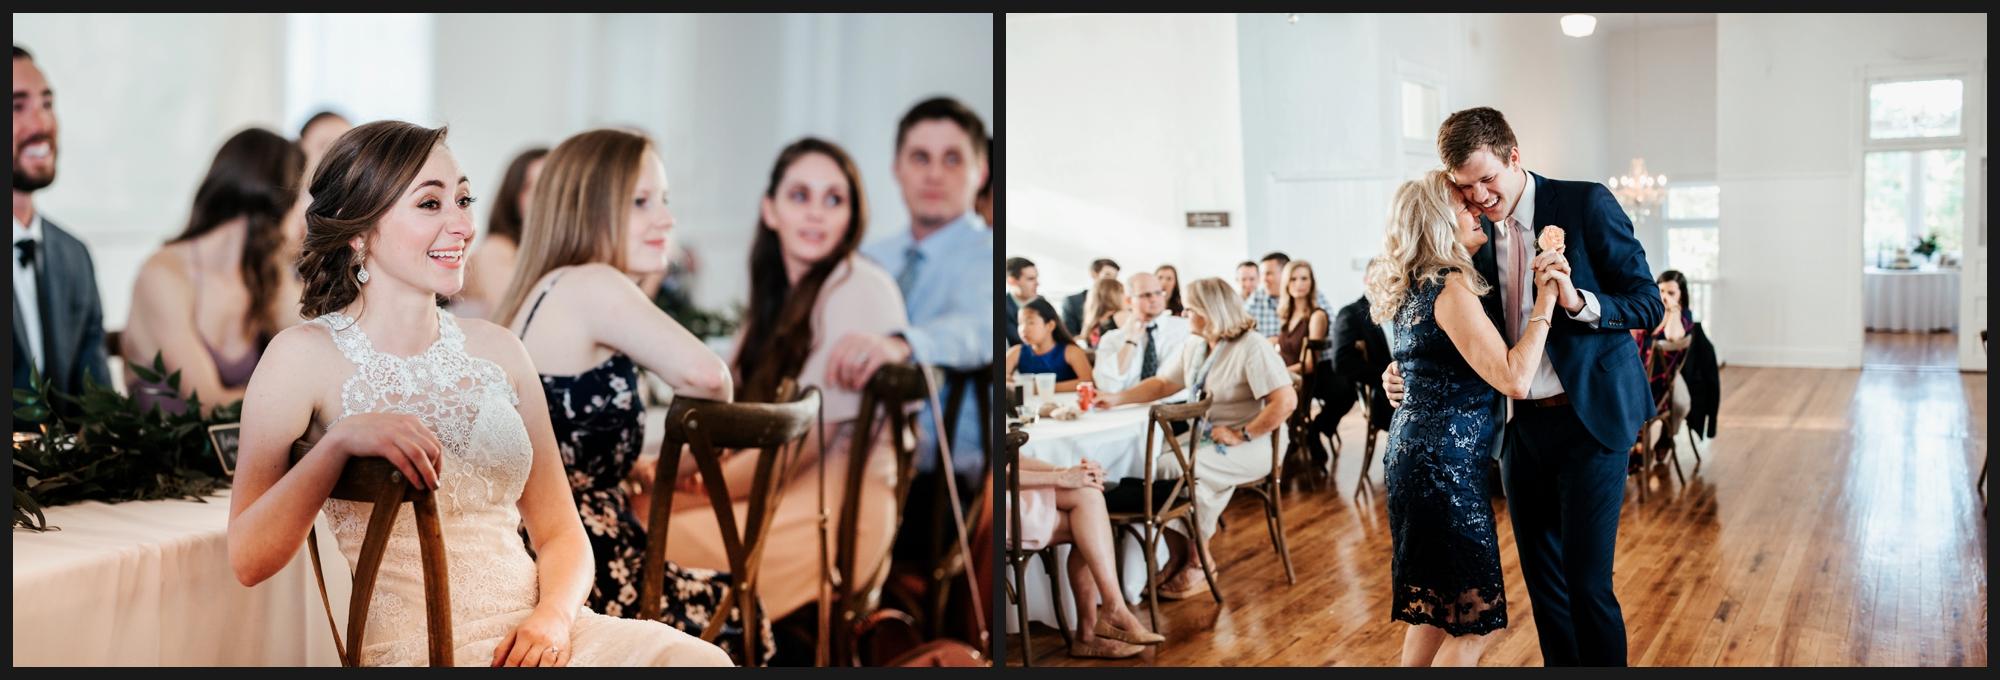 Orlando-Wedding-Photographer-destination-wedding-photographer-florida-wedding-photographer-bohemian-wedding-photographer_1695.jpg